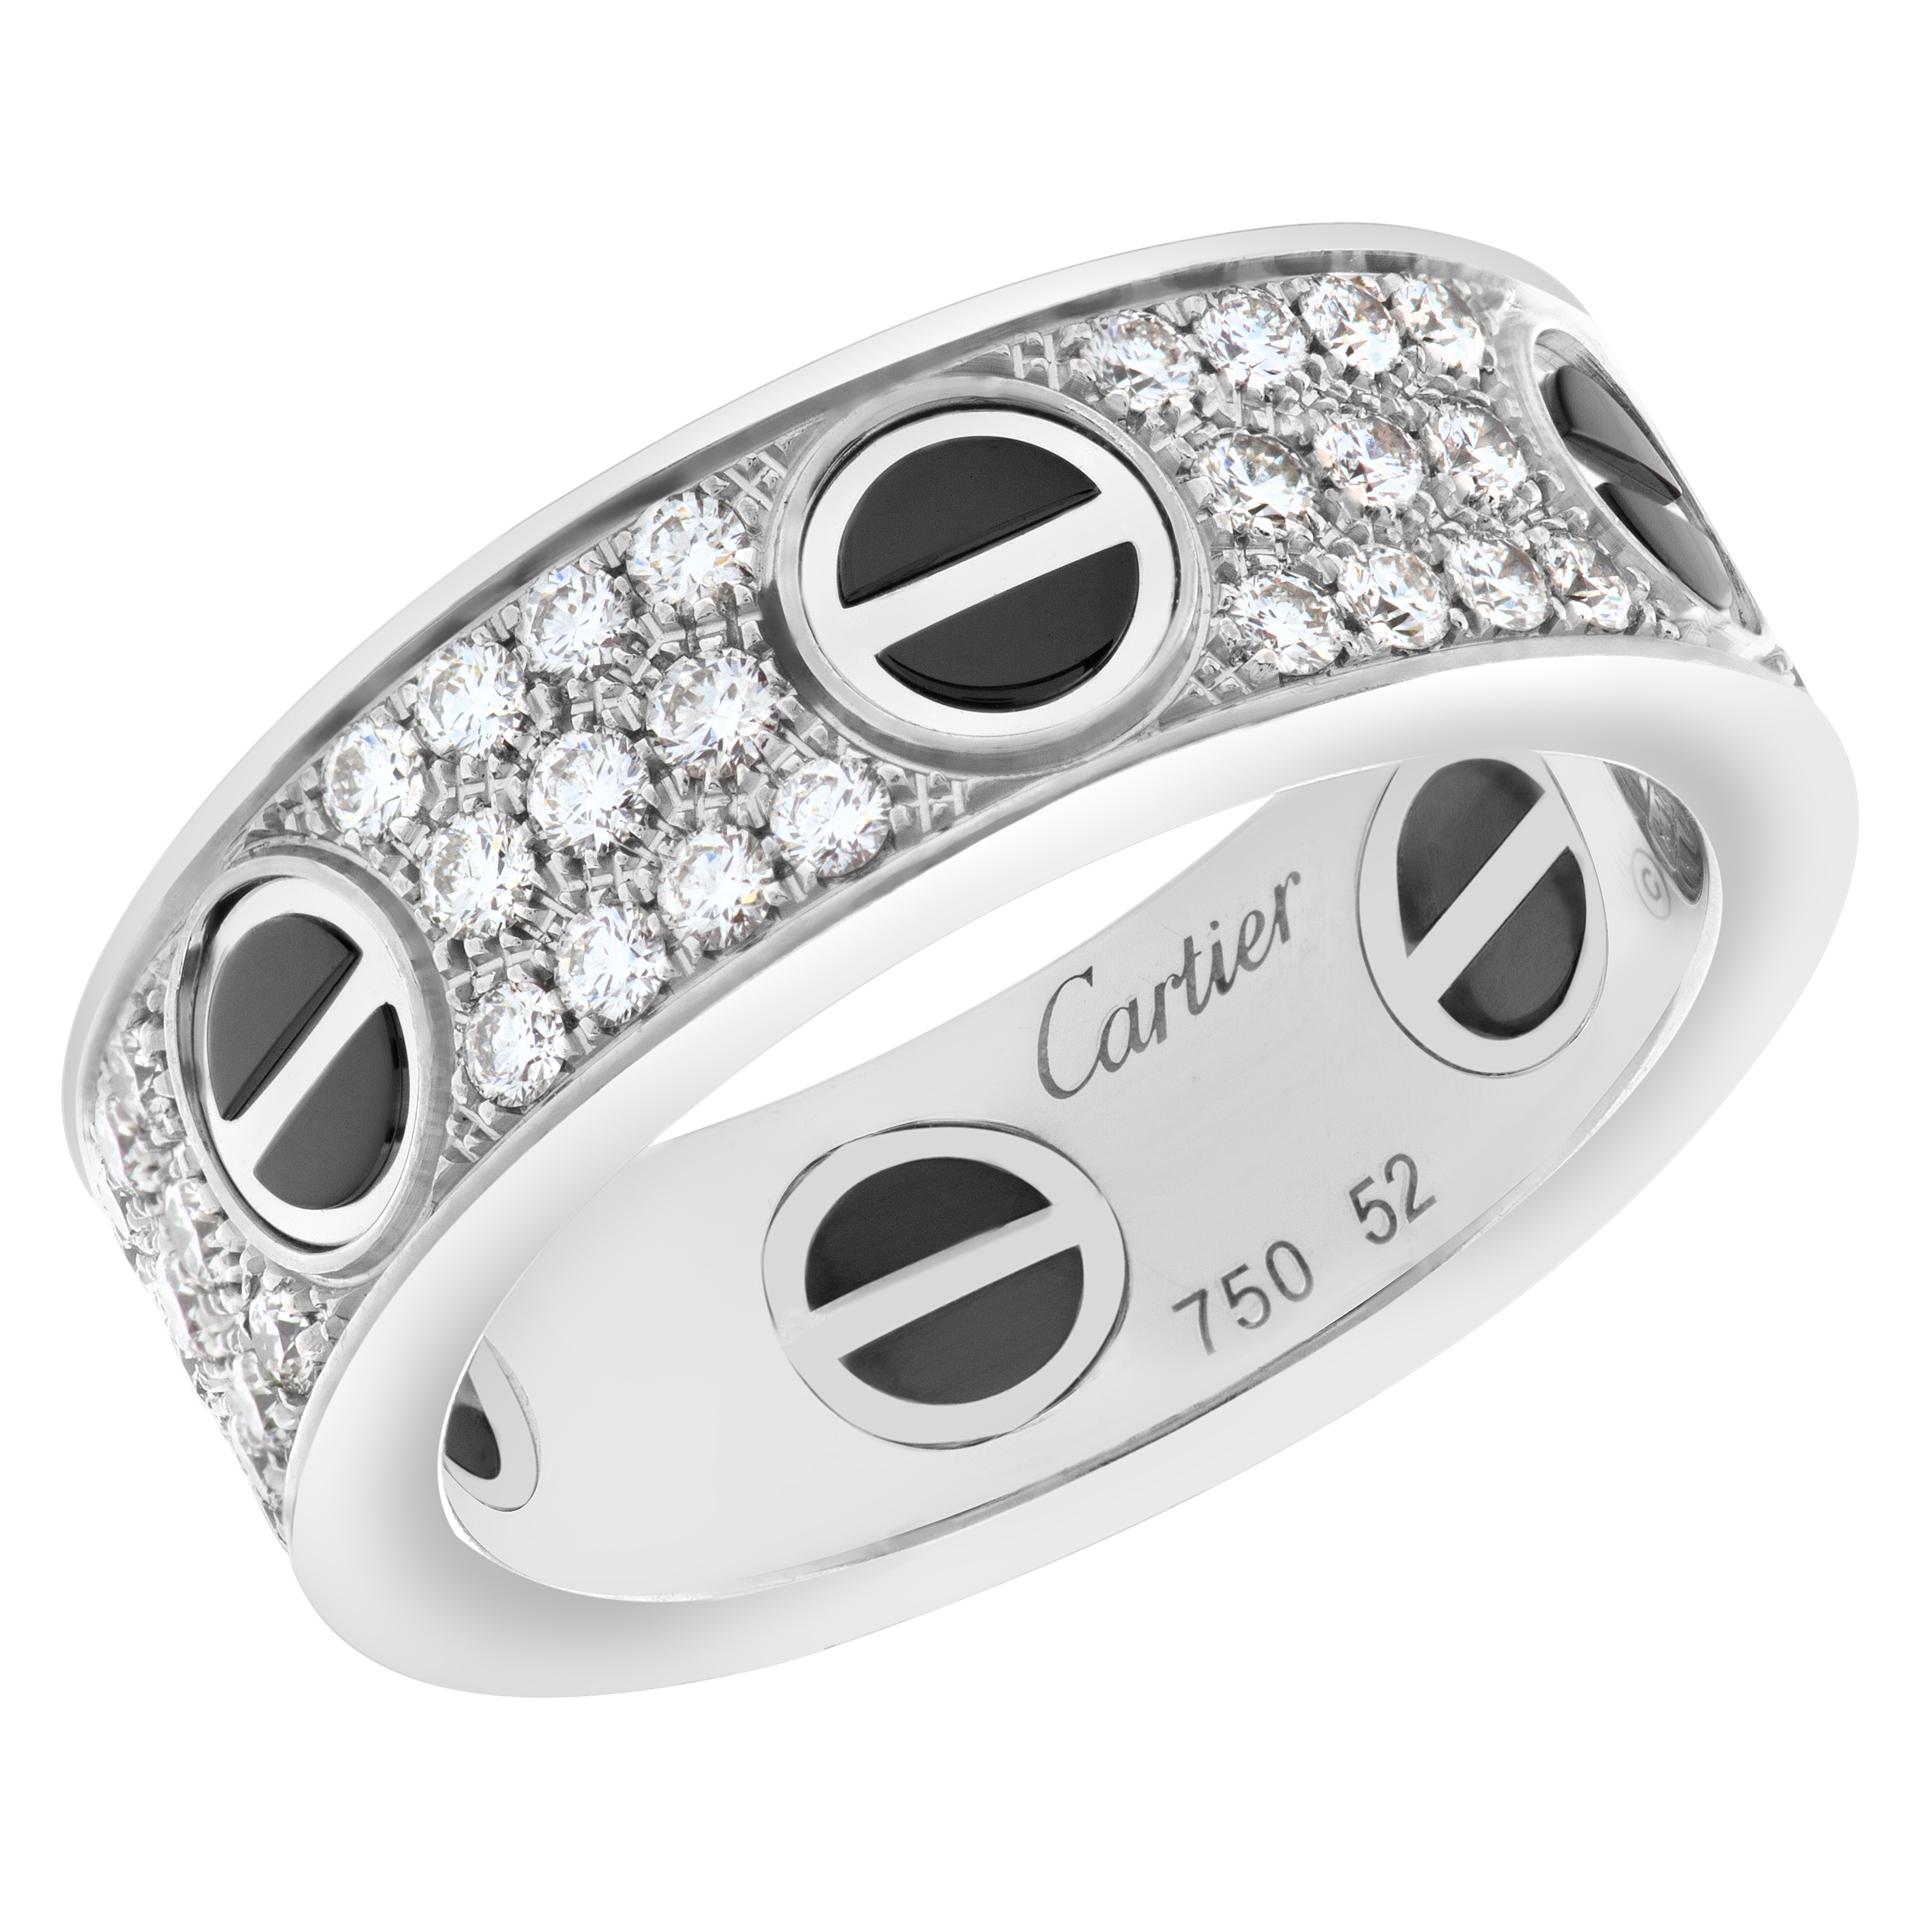 Cartier Love ring, 18K white gold, black ceramic, set with 66 brilliant-cut diamonds